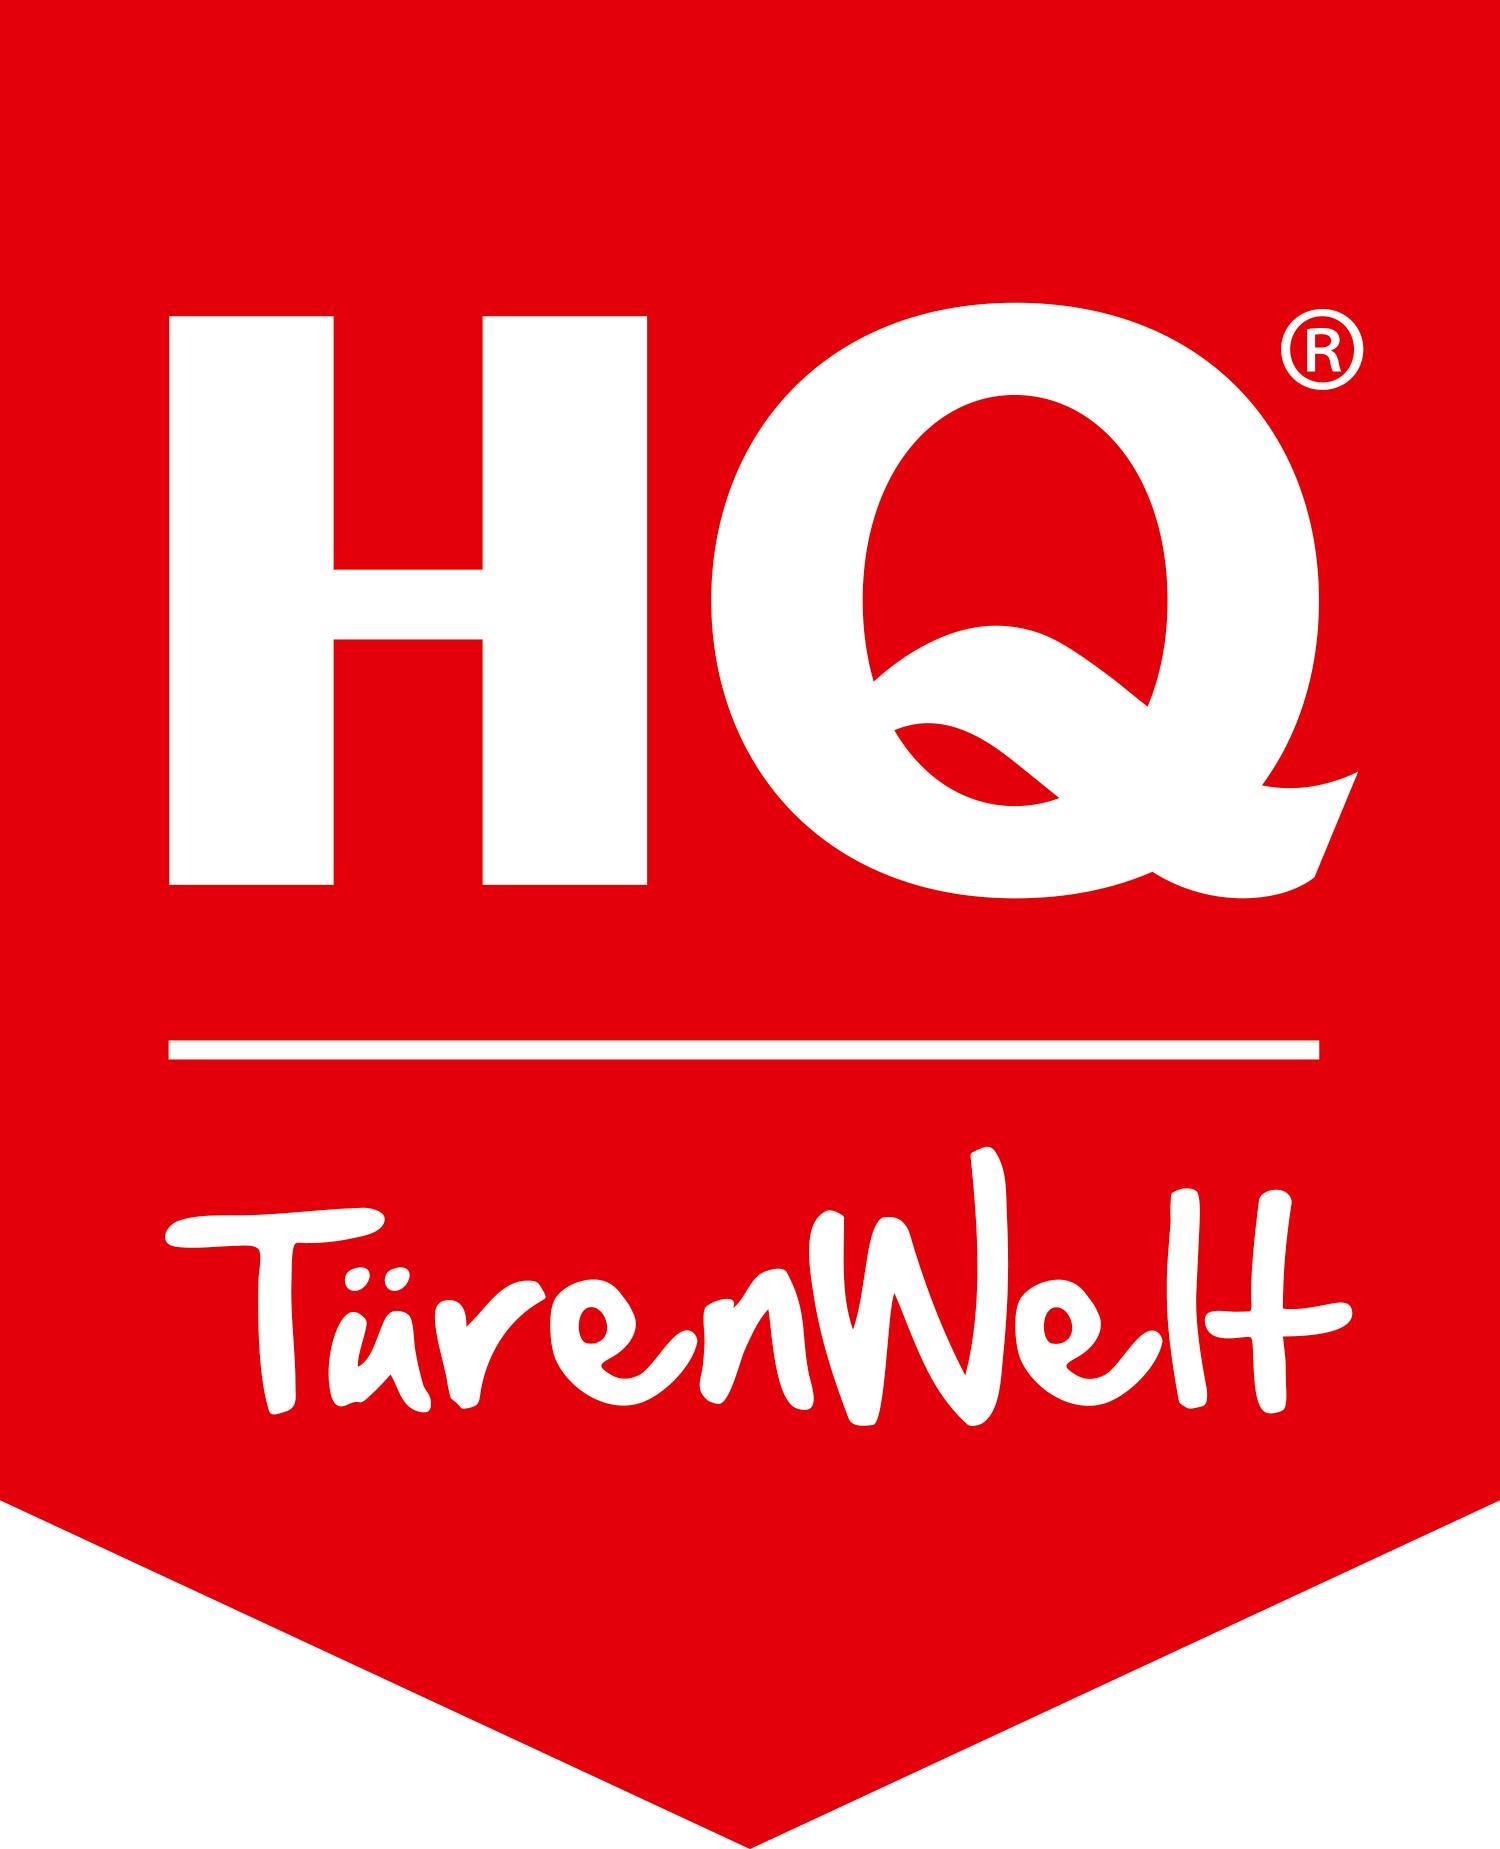 Holzland Dortmund hq türenwelt reviews brand information holzland gmbh deutsche